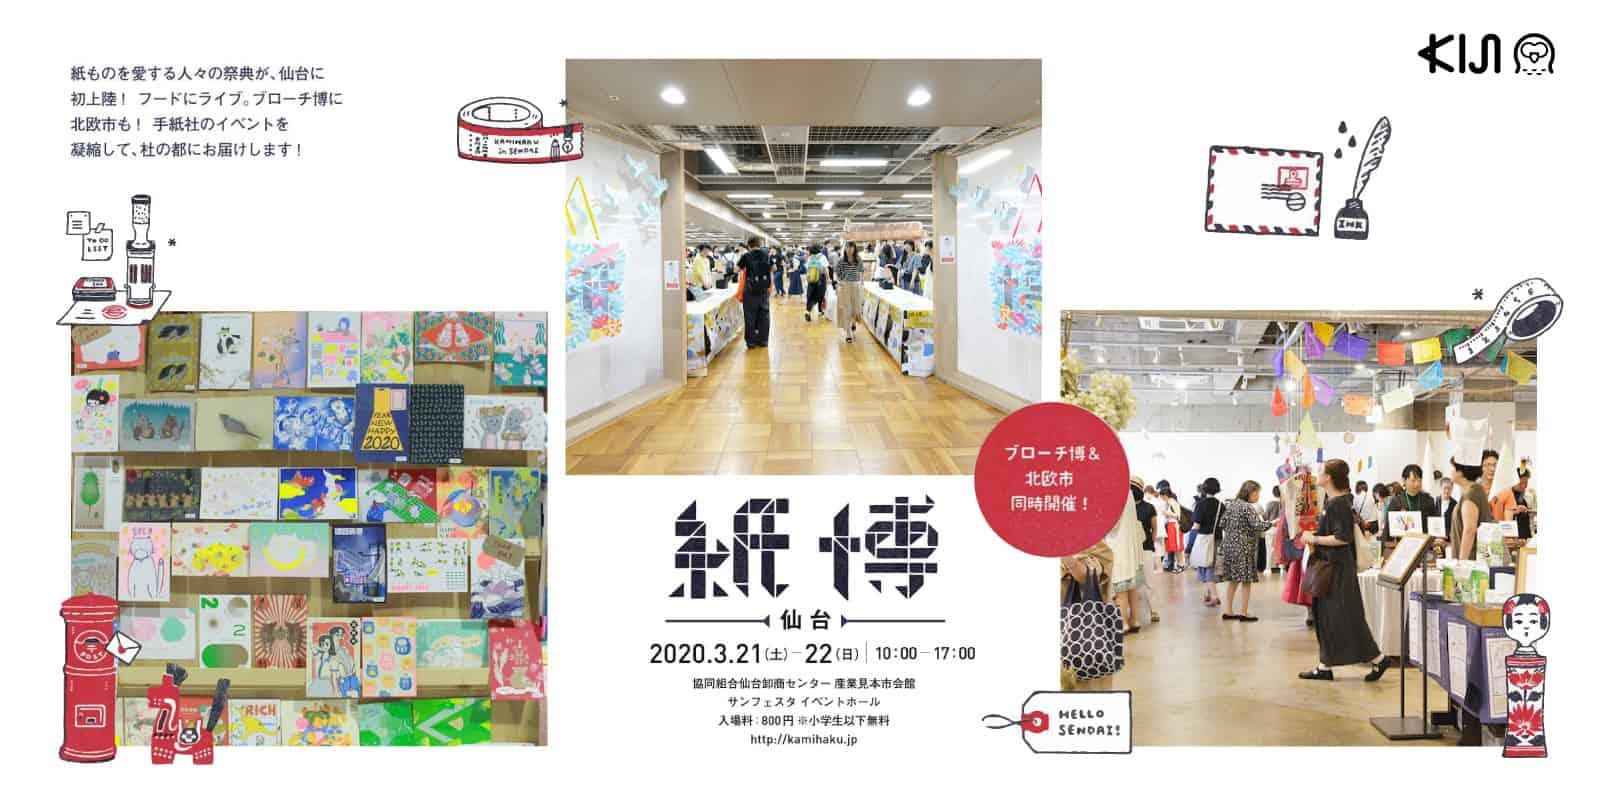 Kamihaku in Sendai มหกรรมกระดาษ